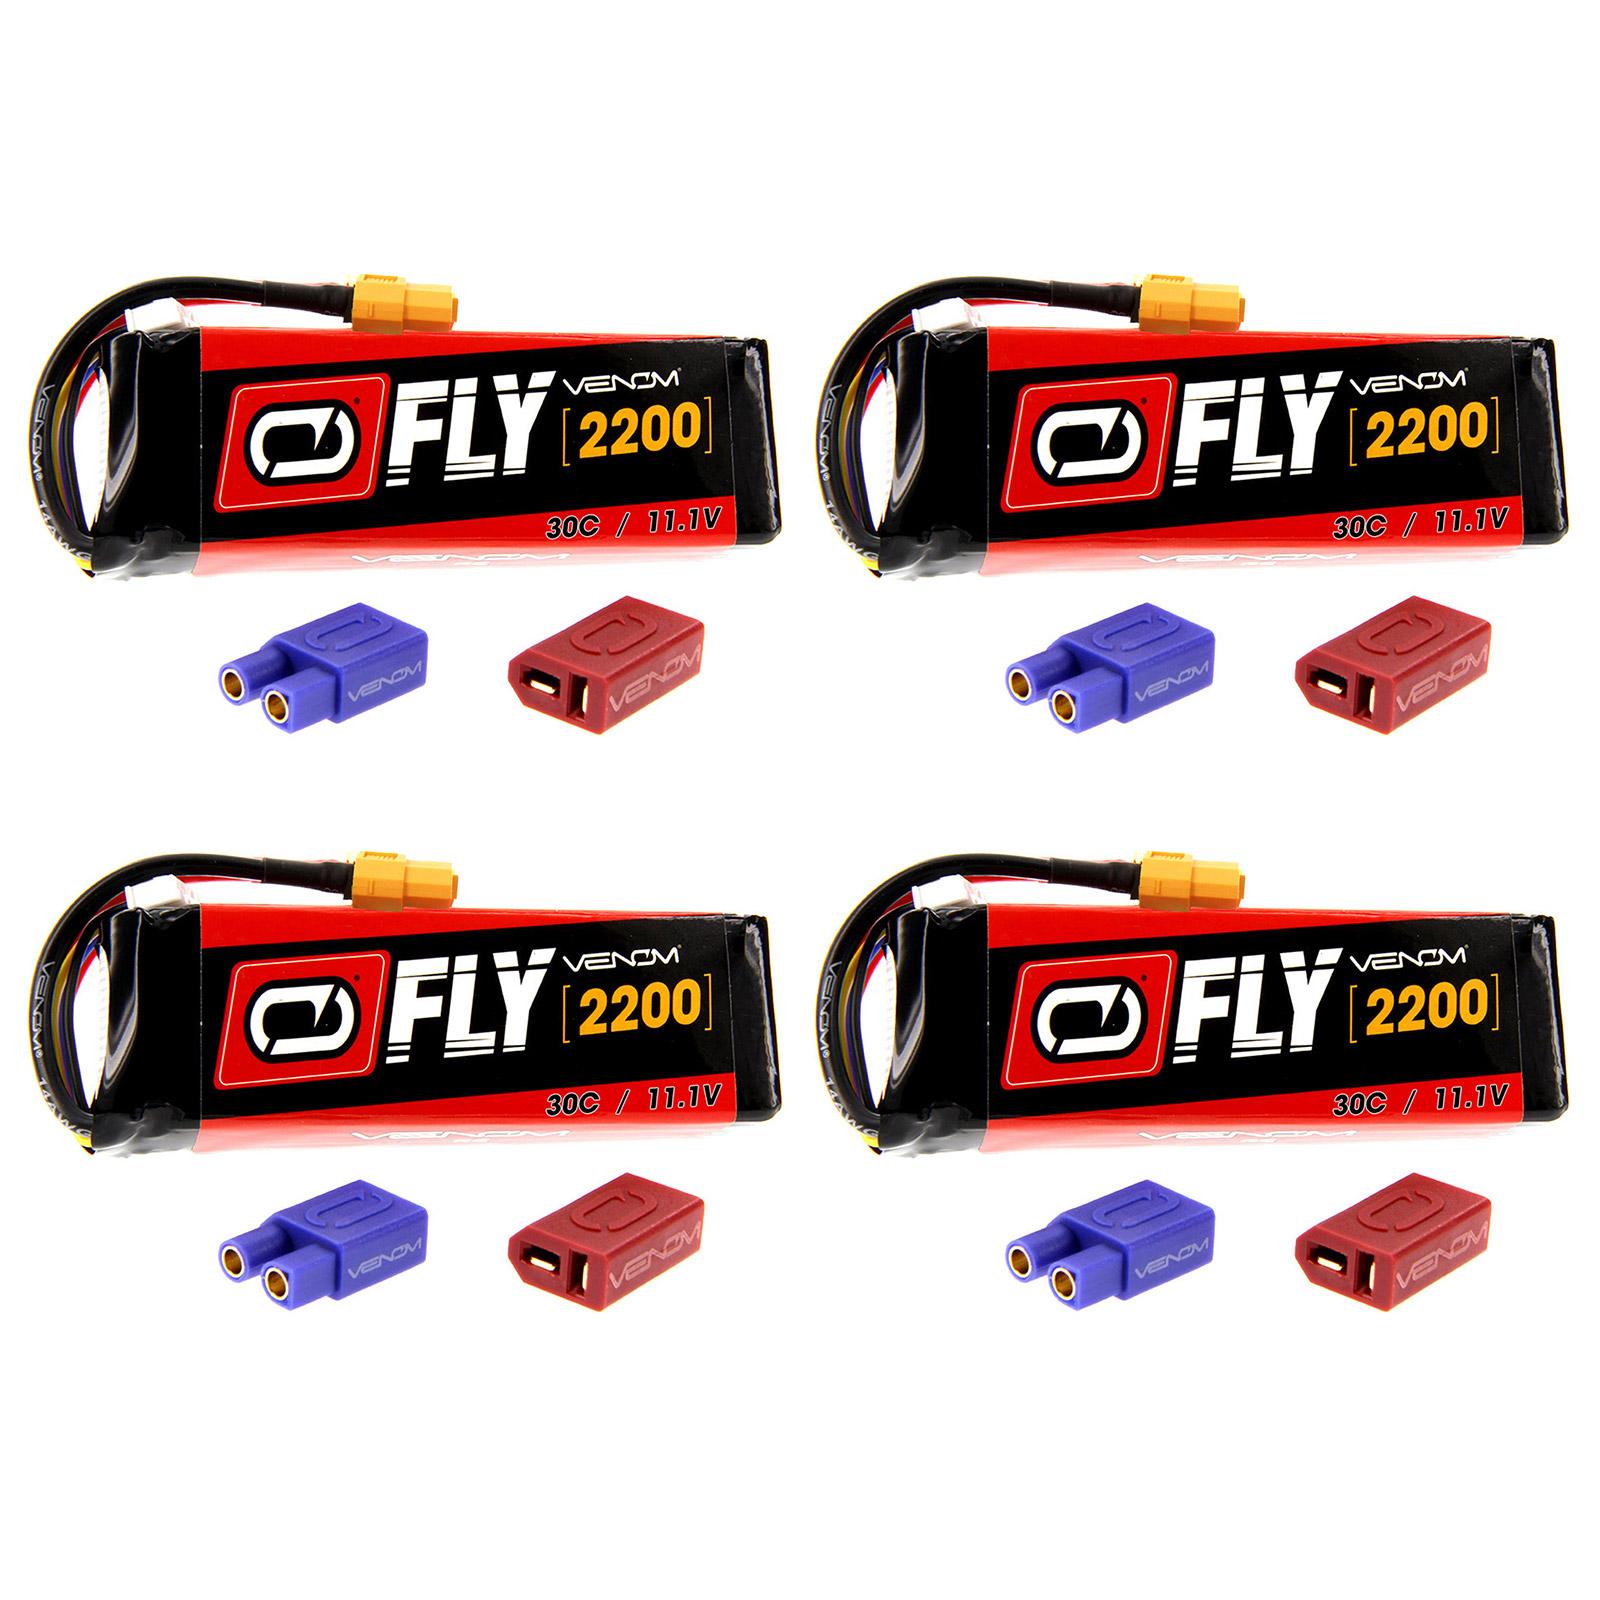 Venom Fly 50C 3S 2200mAh 11.1V LiPo Battery with UNI 2.0 Plug